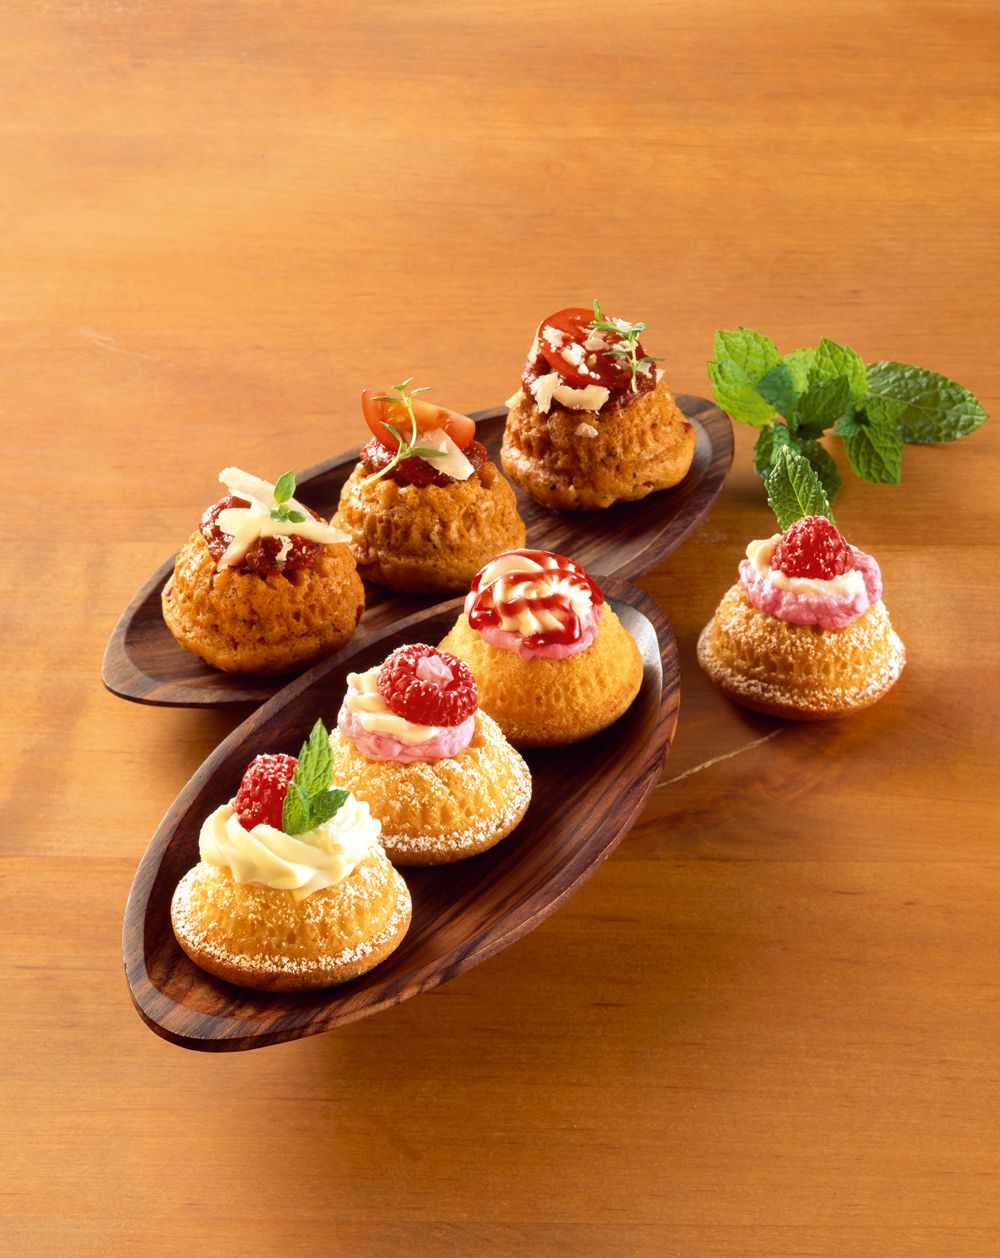 muffin world 12er mini gugelhupf muffinform food muffins und cupcakes gugelhupf mini. Black Bedroom Furniture Sets. Home Design Ideas